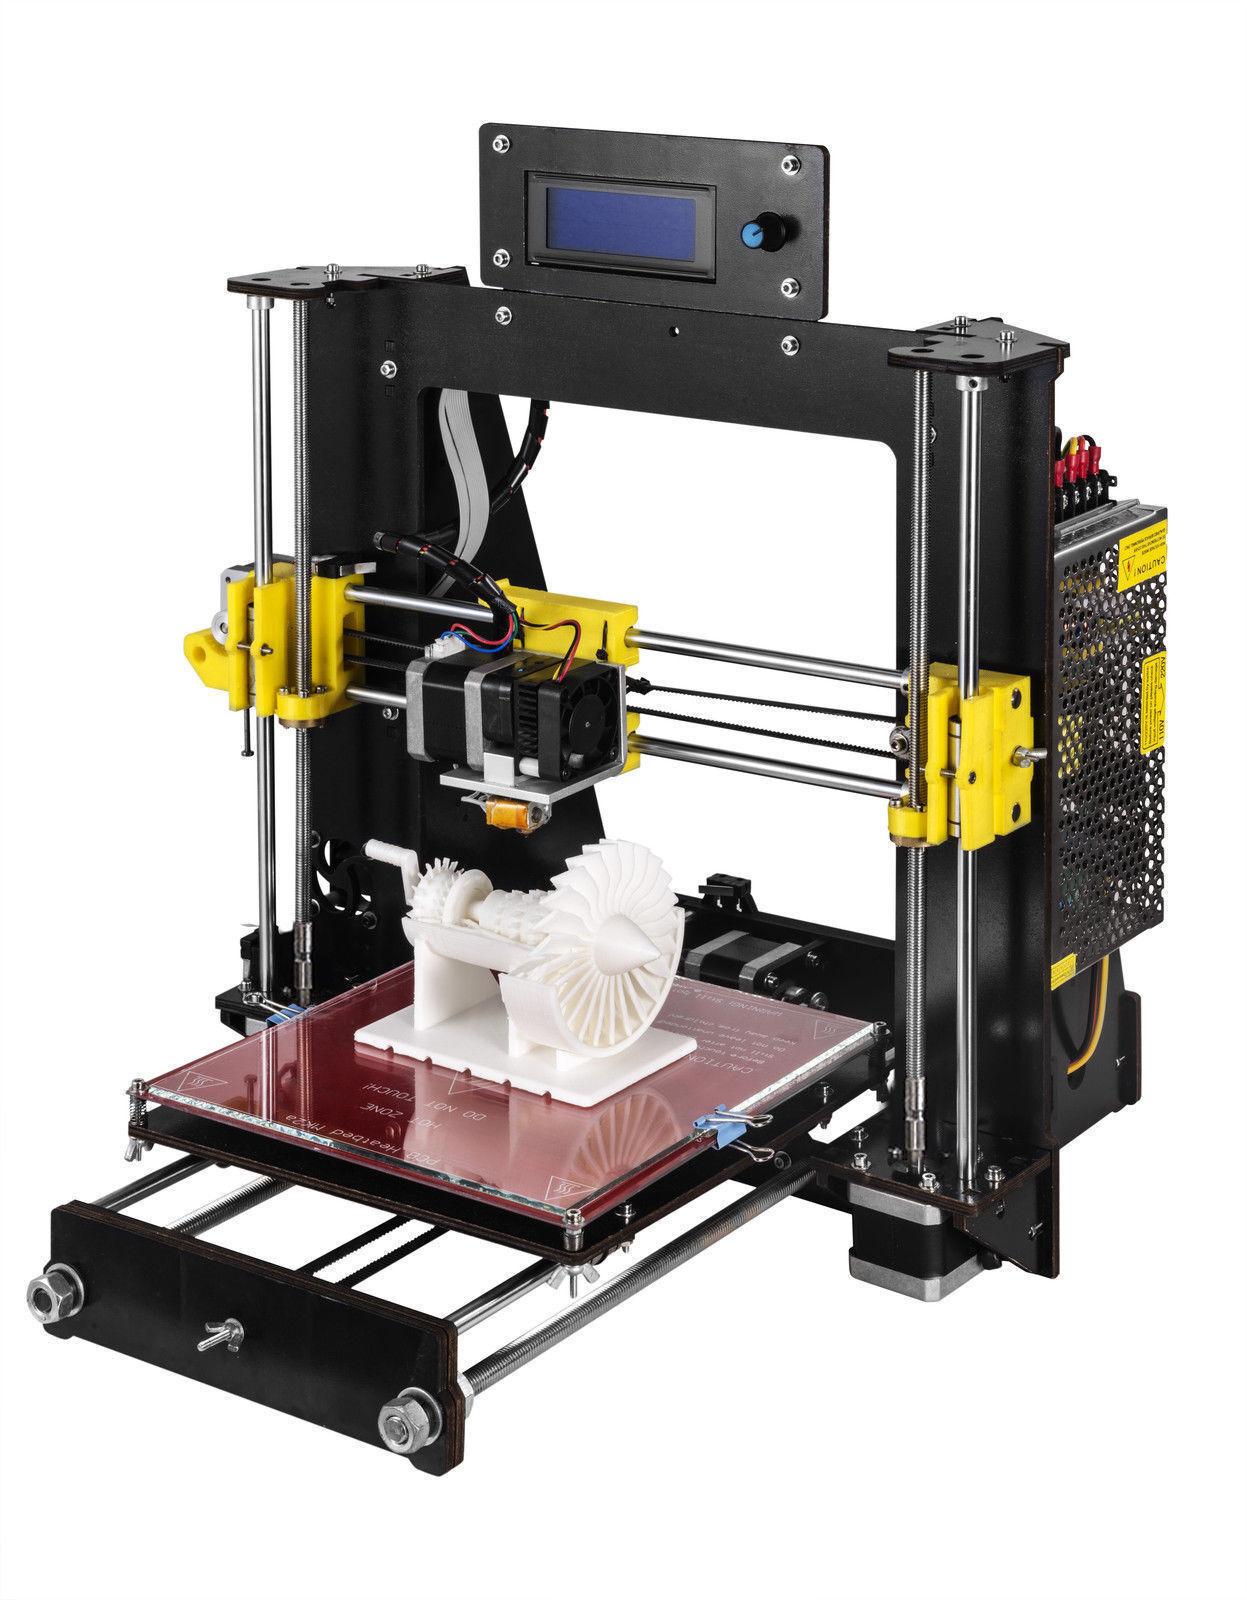 anet a8 3d printer diy i3 upgradest high precision reprap prusa 3d drucker dhl ebay. Black Bedroom Furniture Sets. Home Design Ideas